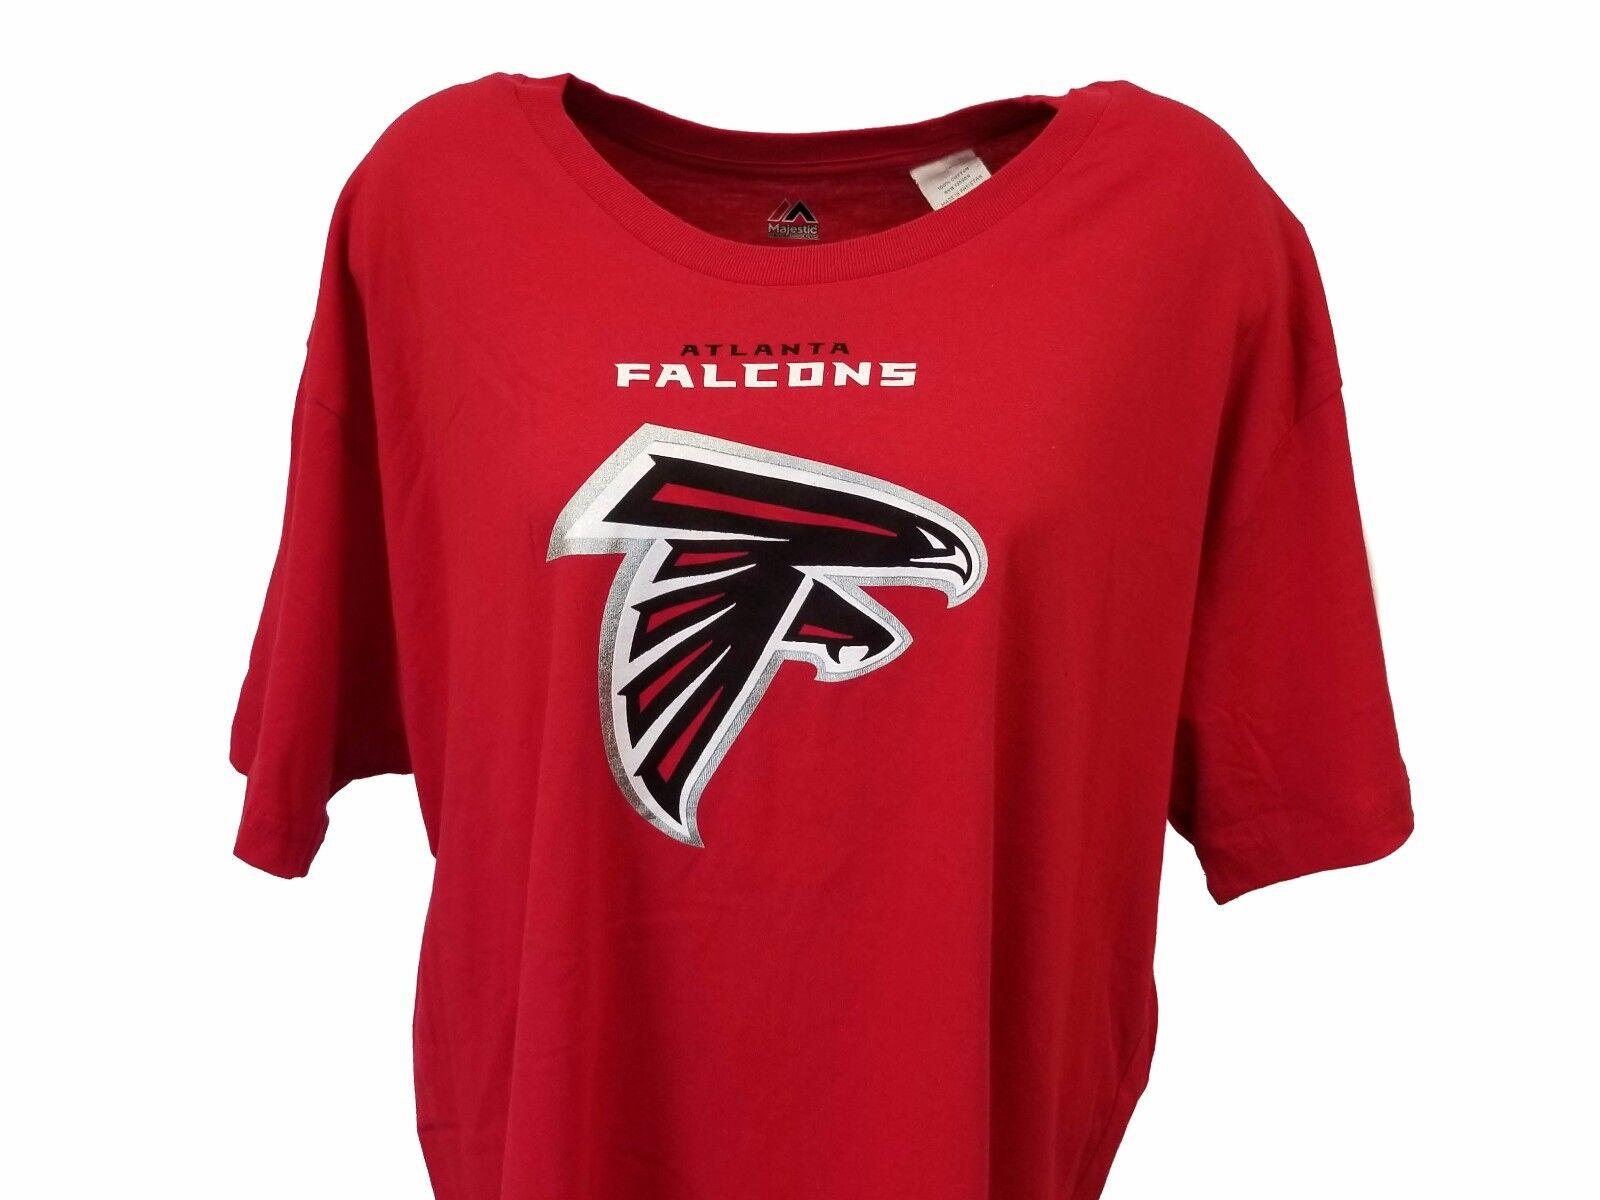 NFL T-Shirt Red Women's Plus Size 1X 2X